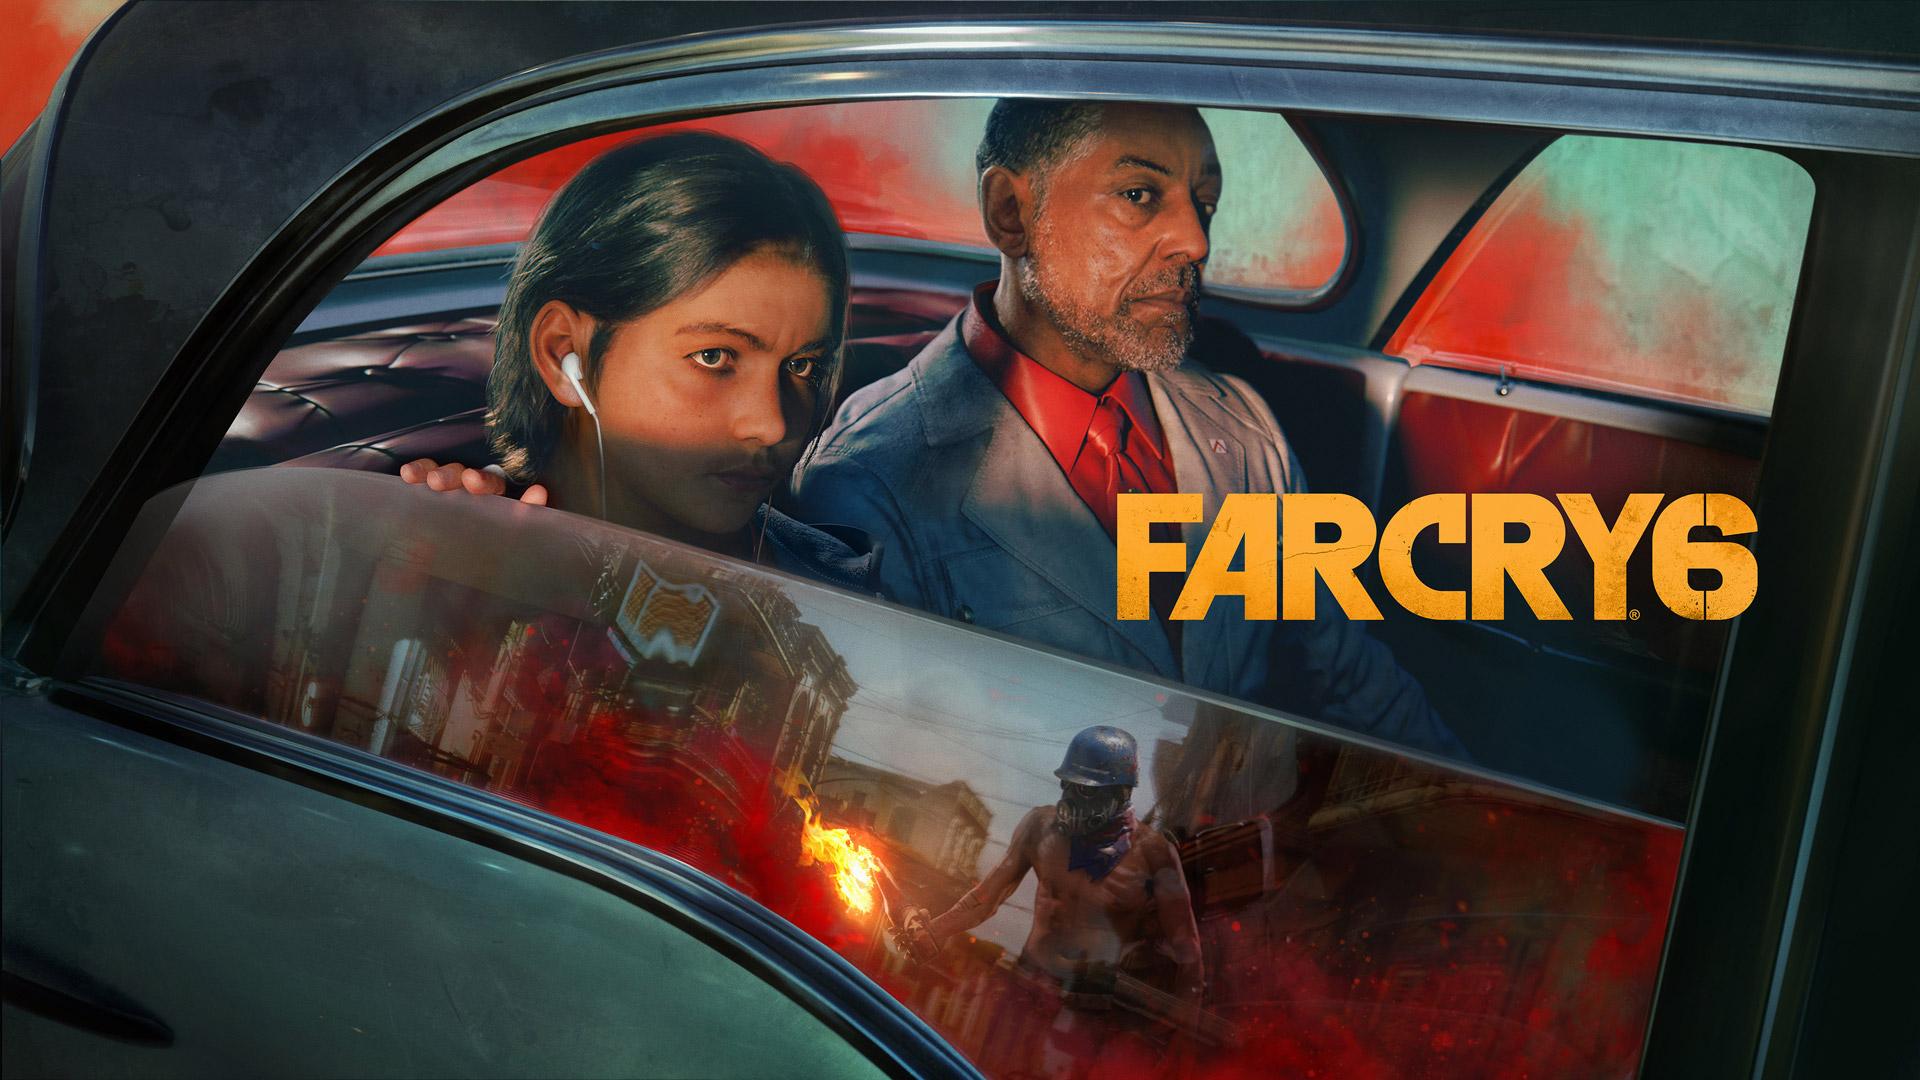 Free Far Cry 6 Wallpaper in 1920x1080